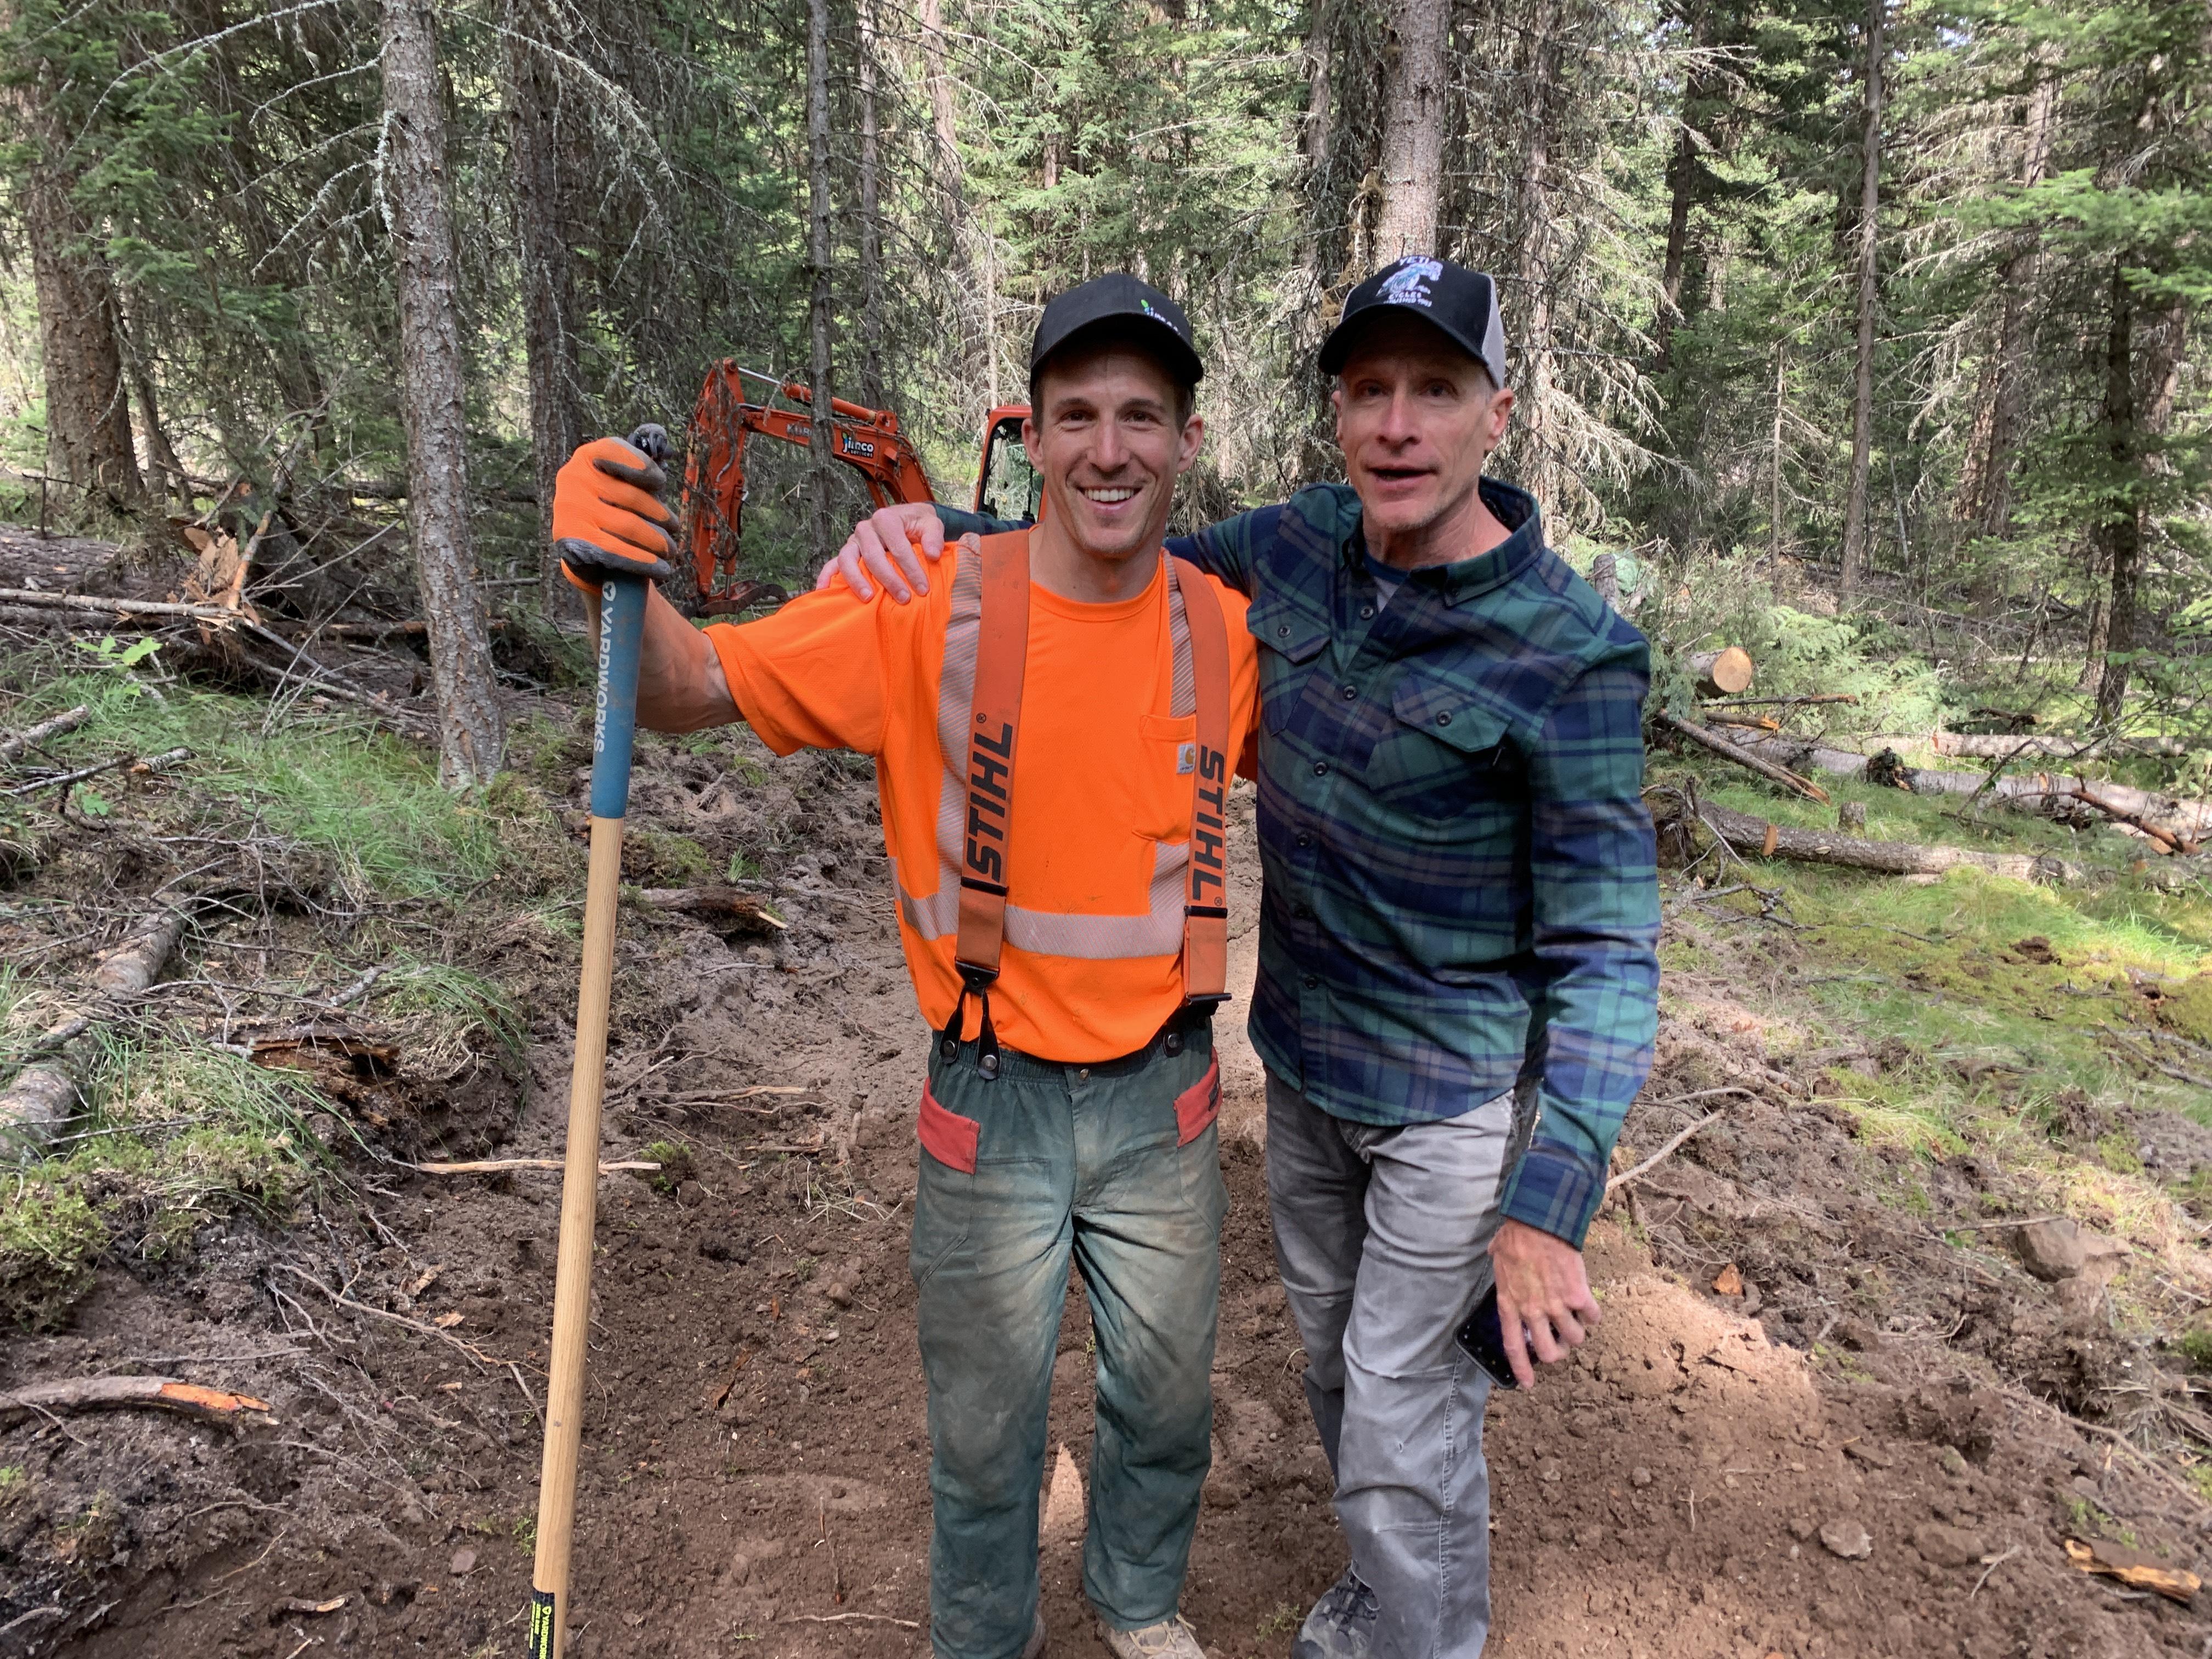 100 Mile House mountain biking Steve Law and James Doerfling